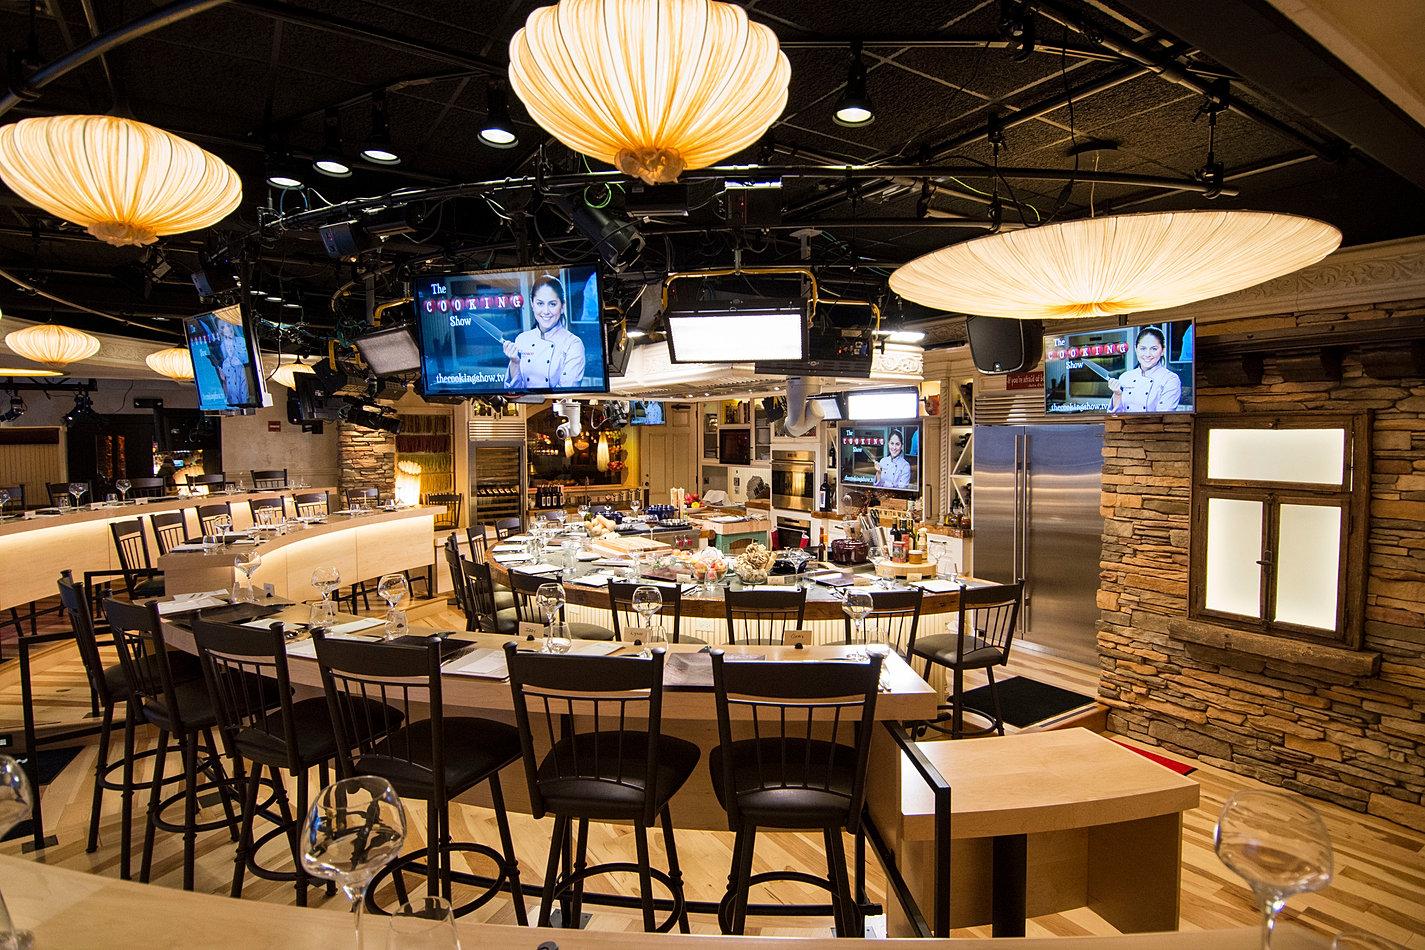 Rustic Kitchen Hingham Menu The Studio Kitchen The Culinary Entertainment Destination